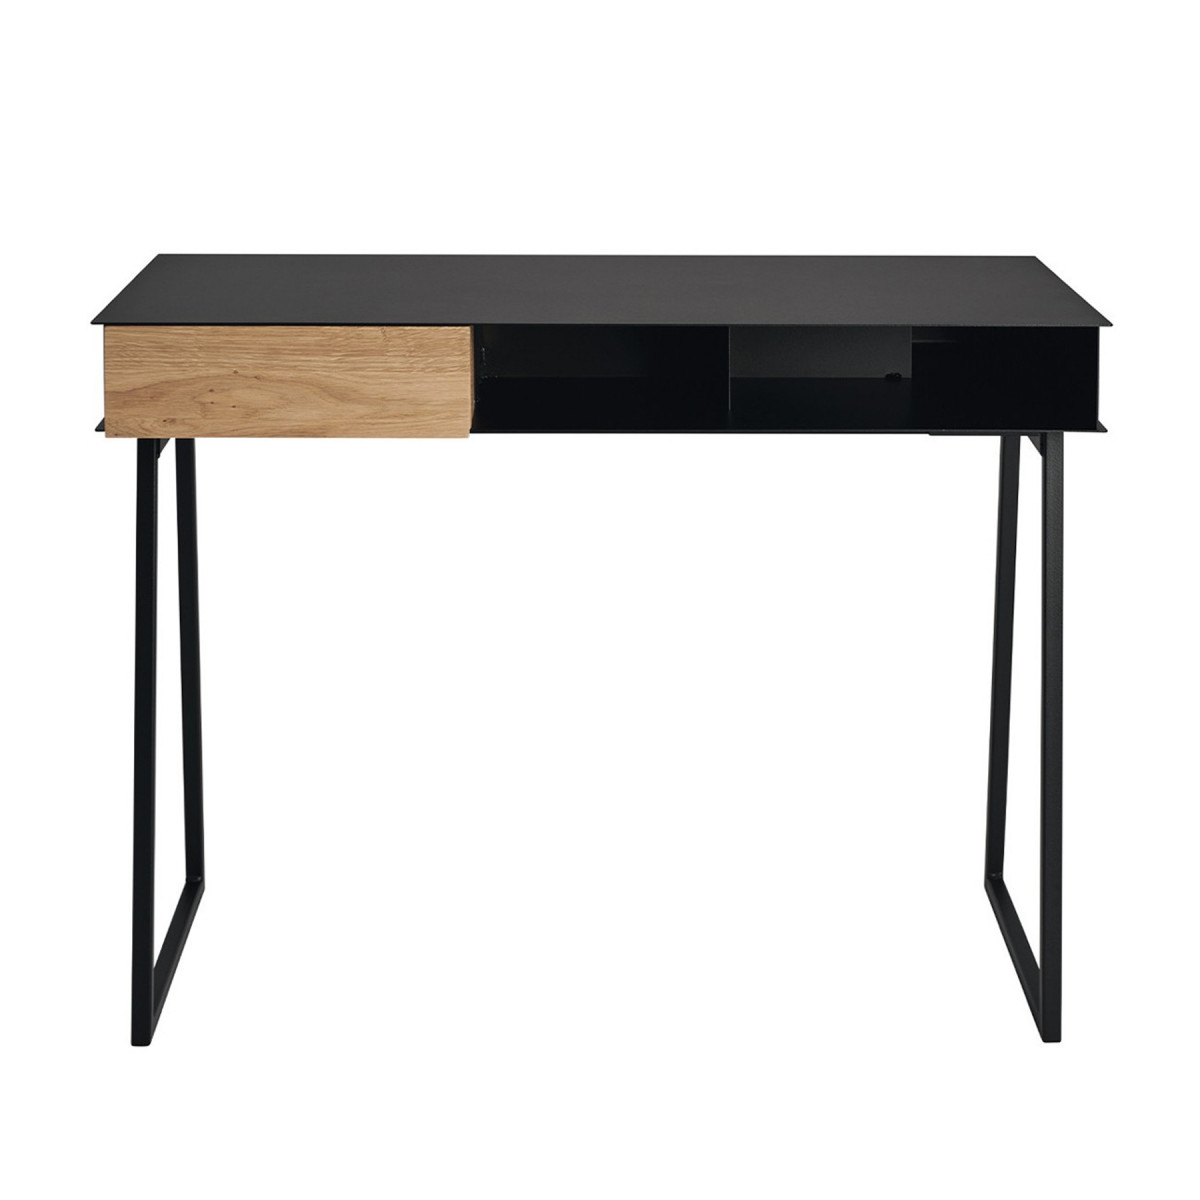 Astor Desk - Résistub Productions